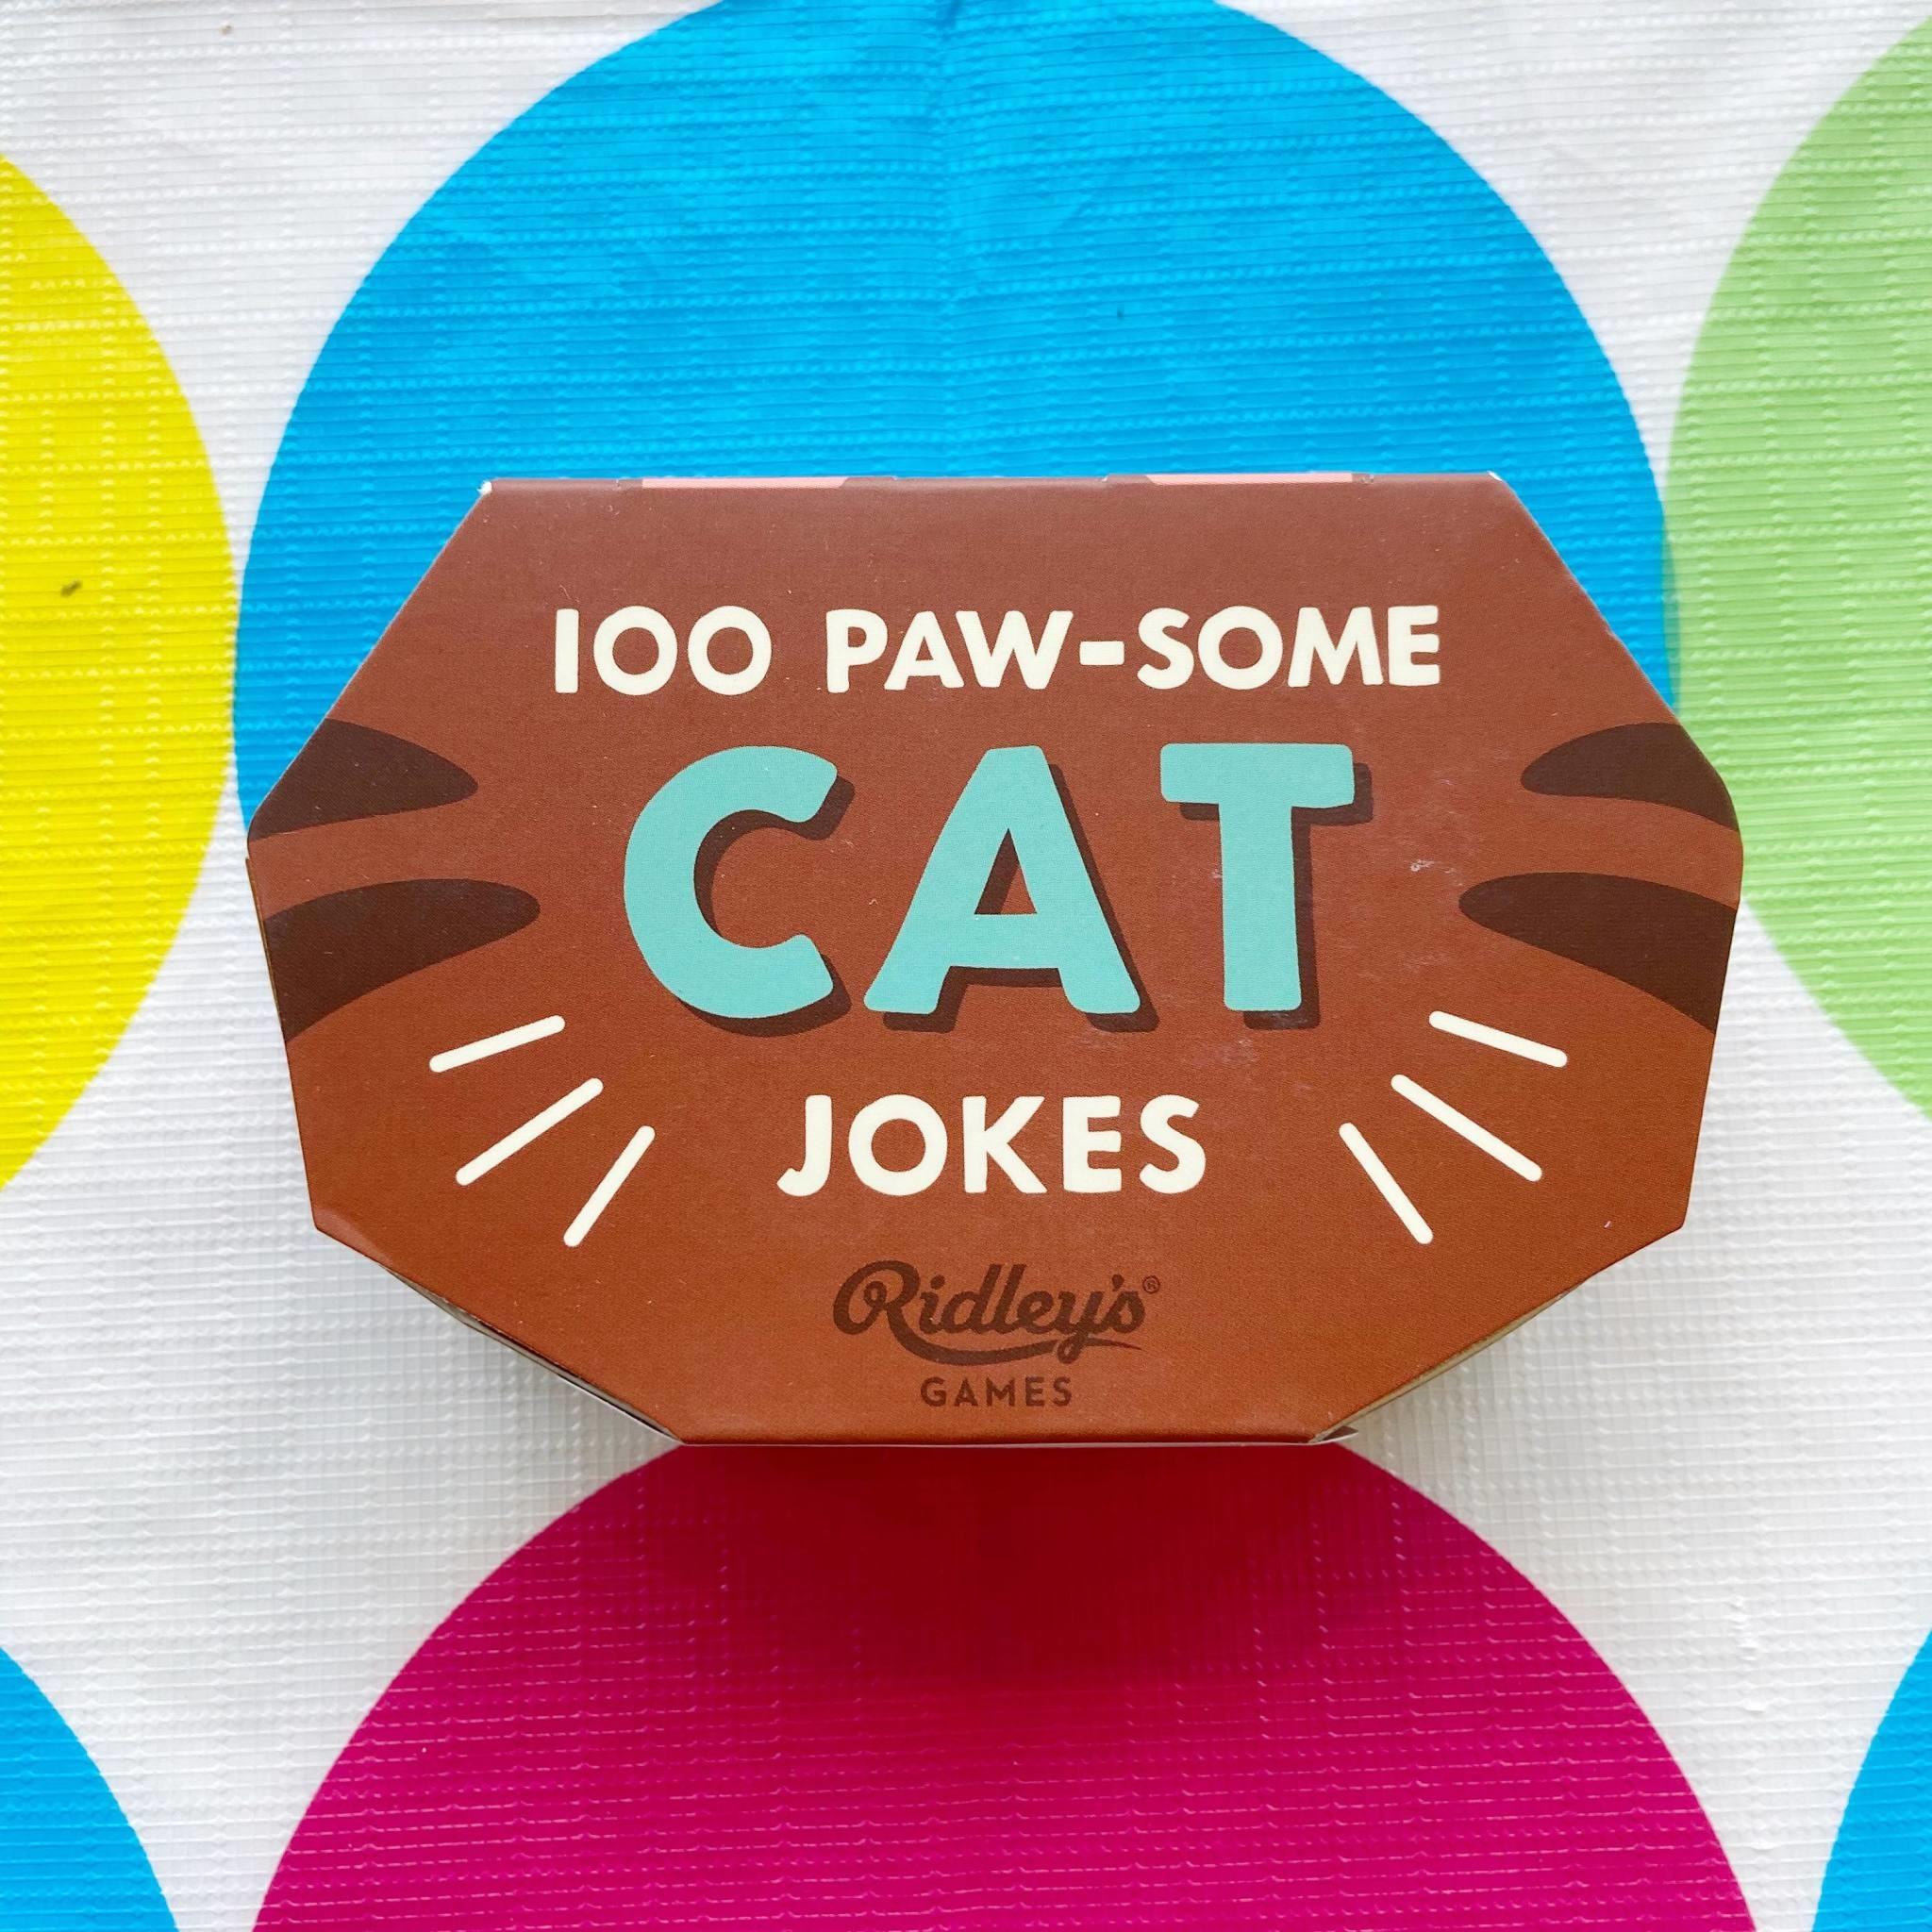 100 Paw-some Cat Jokes